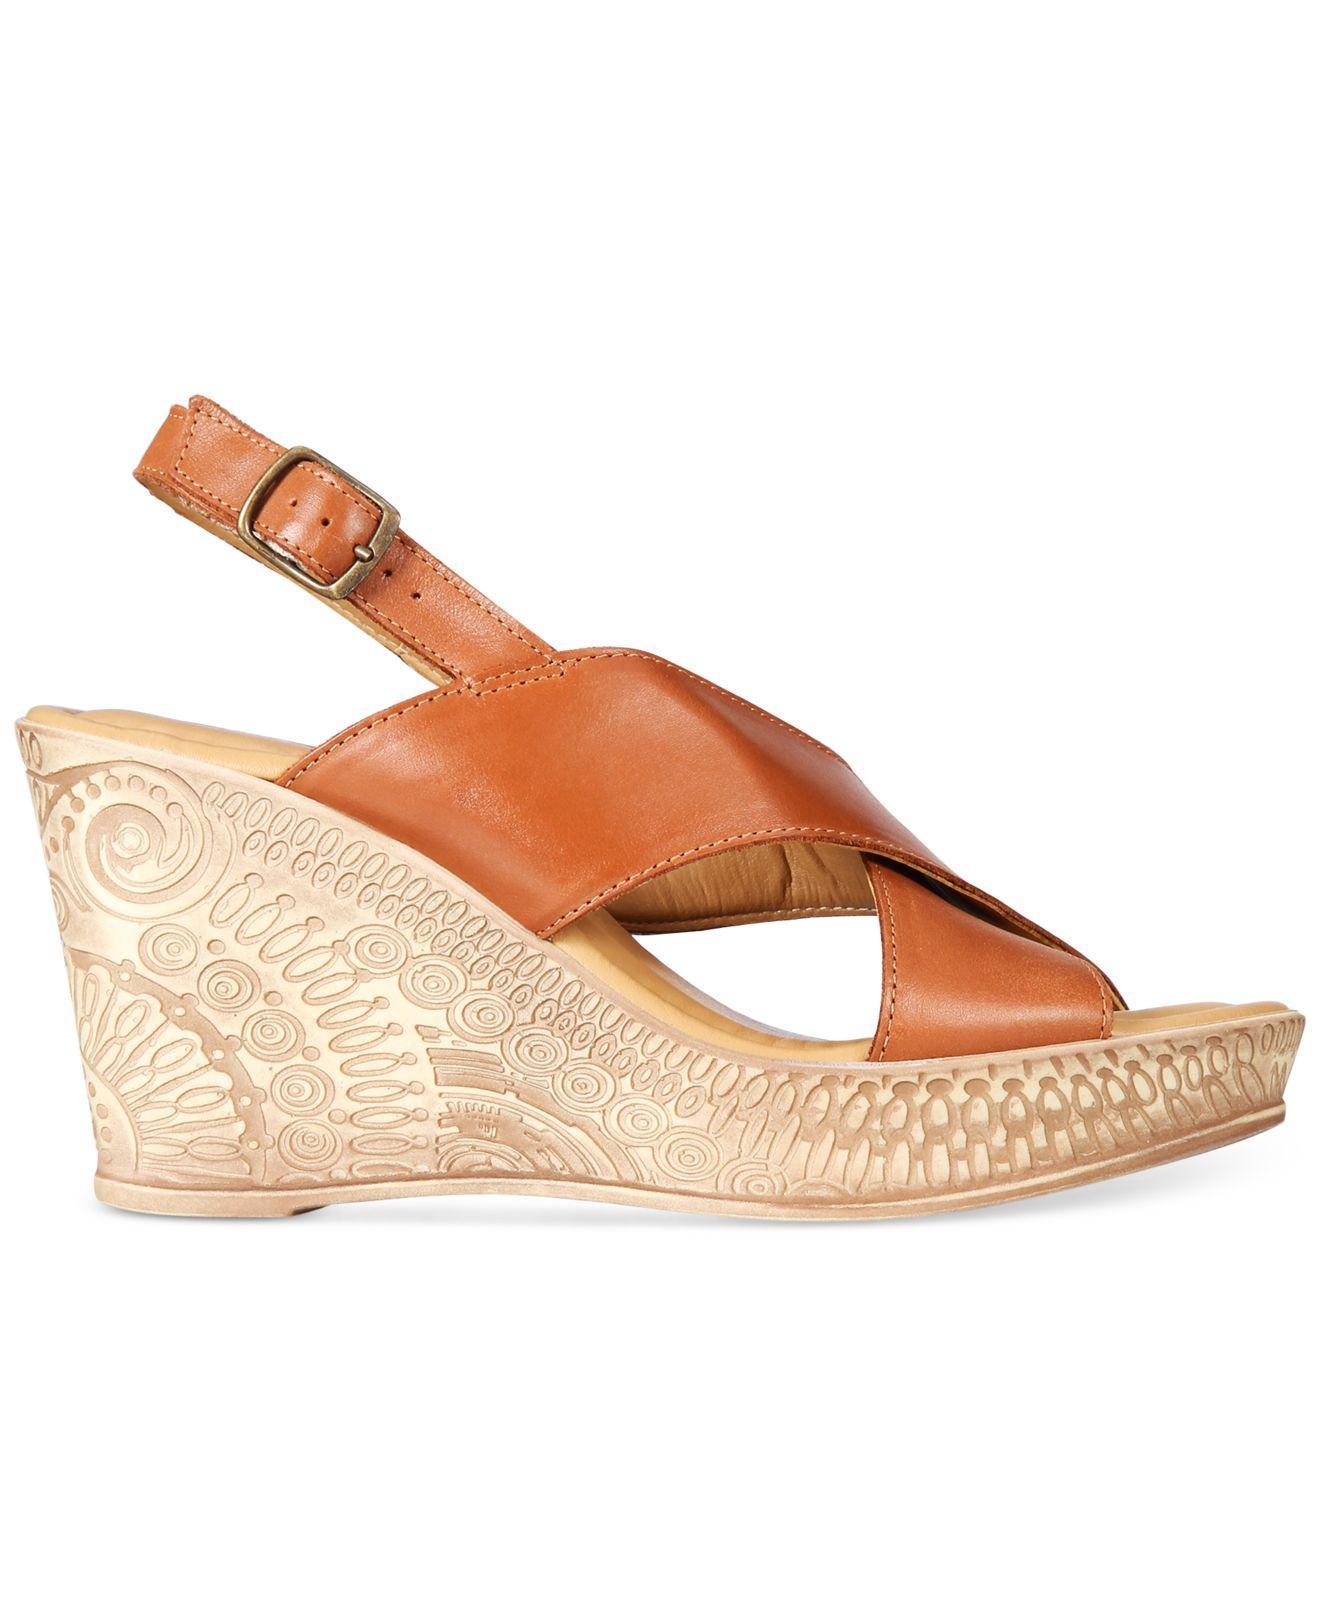 Lyst Bella Vita Lea Italy Wedge Sandals In Brown